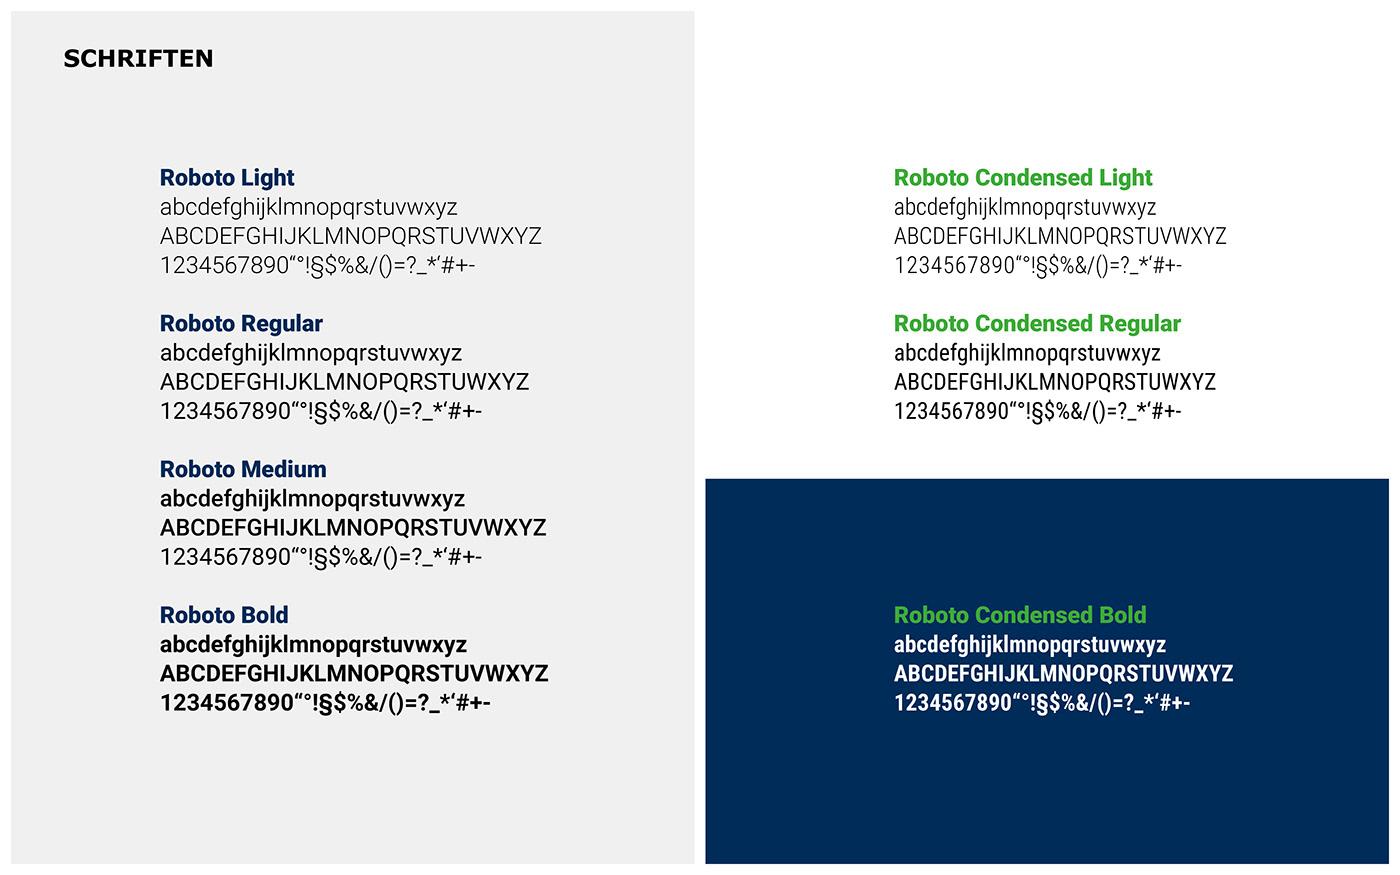 basic design Brand Design branding  Corporate Design graphic design  Keyvisual logo rotherdesign Signet visual identity